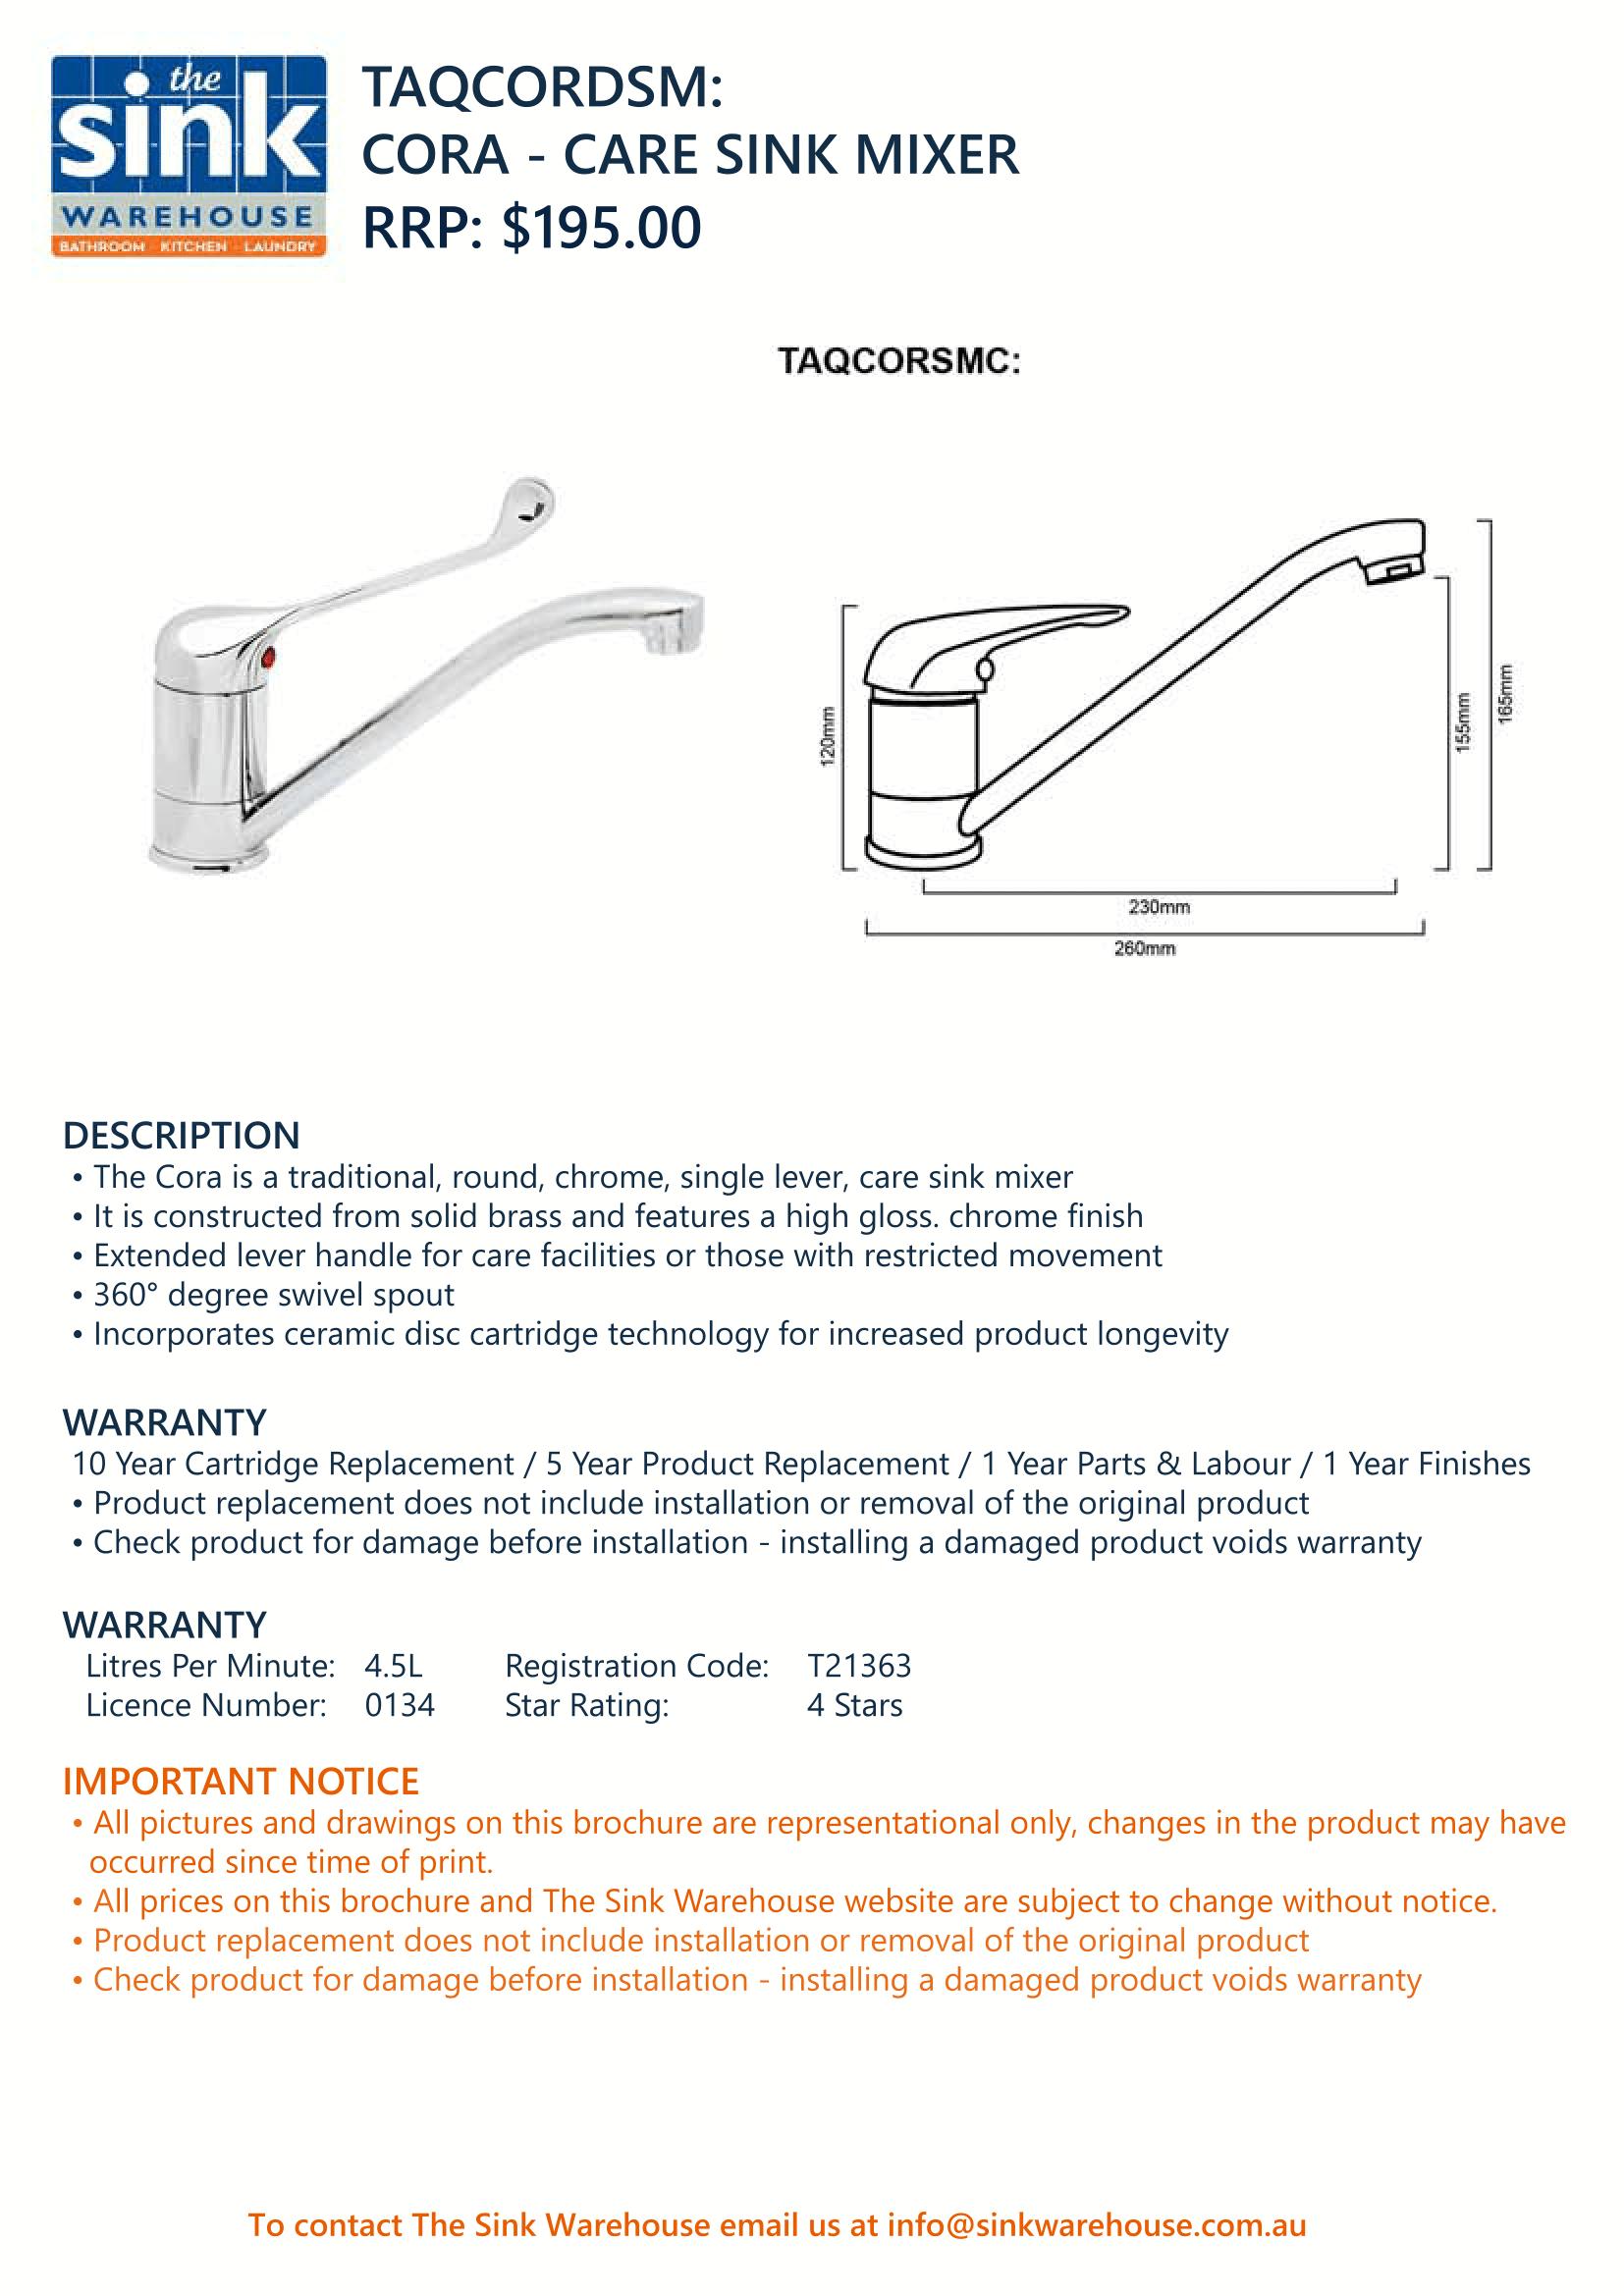 taqcordsm-product-spec-sheet-1.png